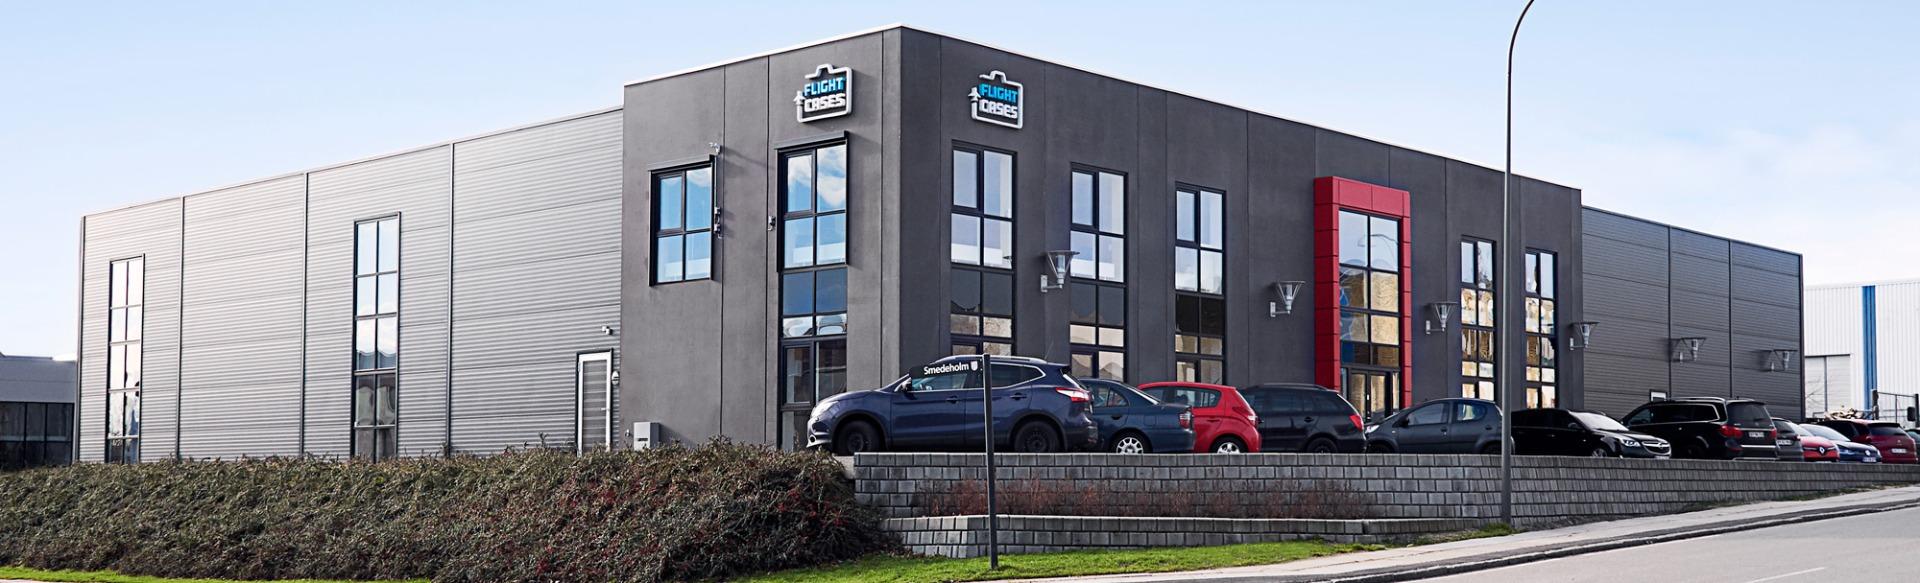 Flightcase Factory in Herlev - Vesterlundvej 3 2014 -